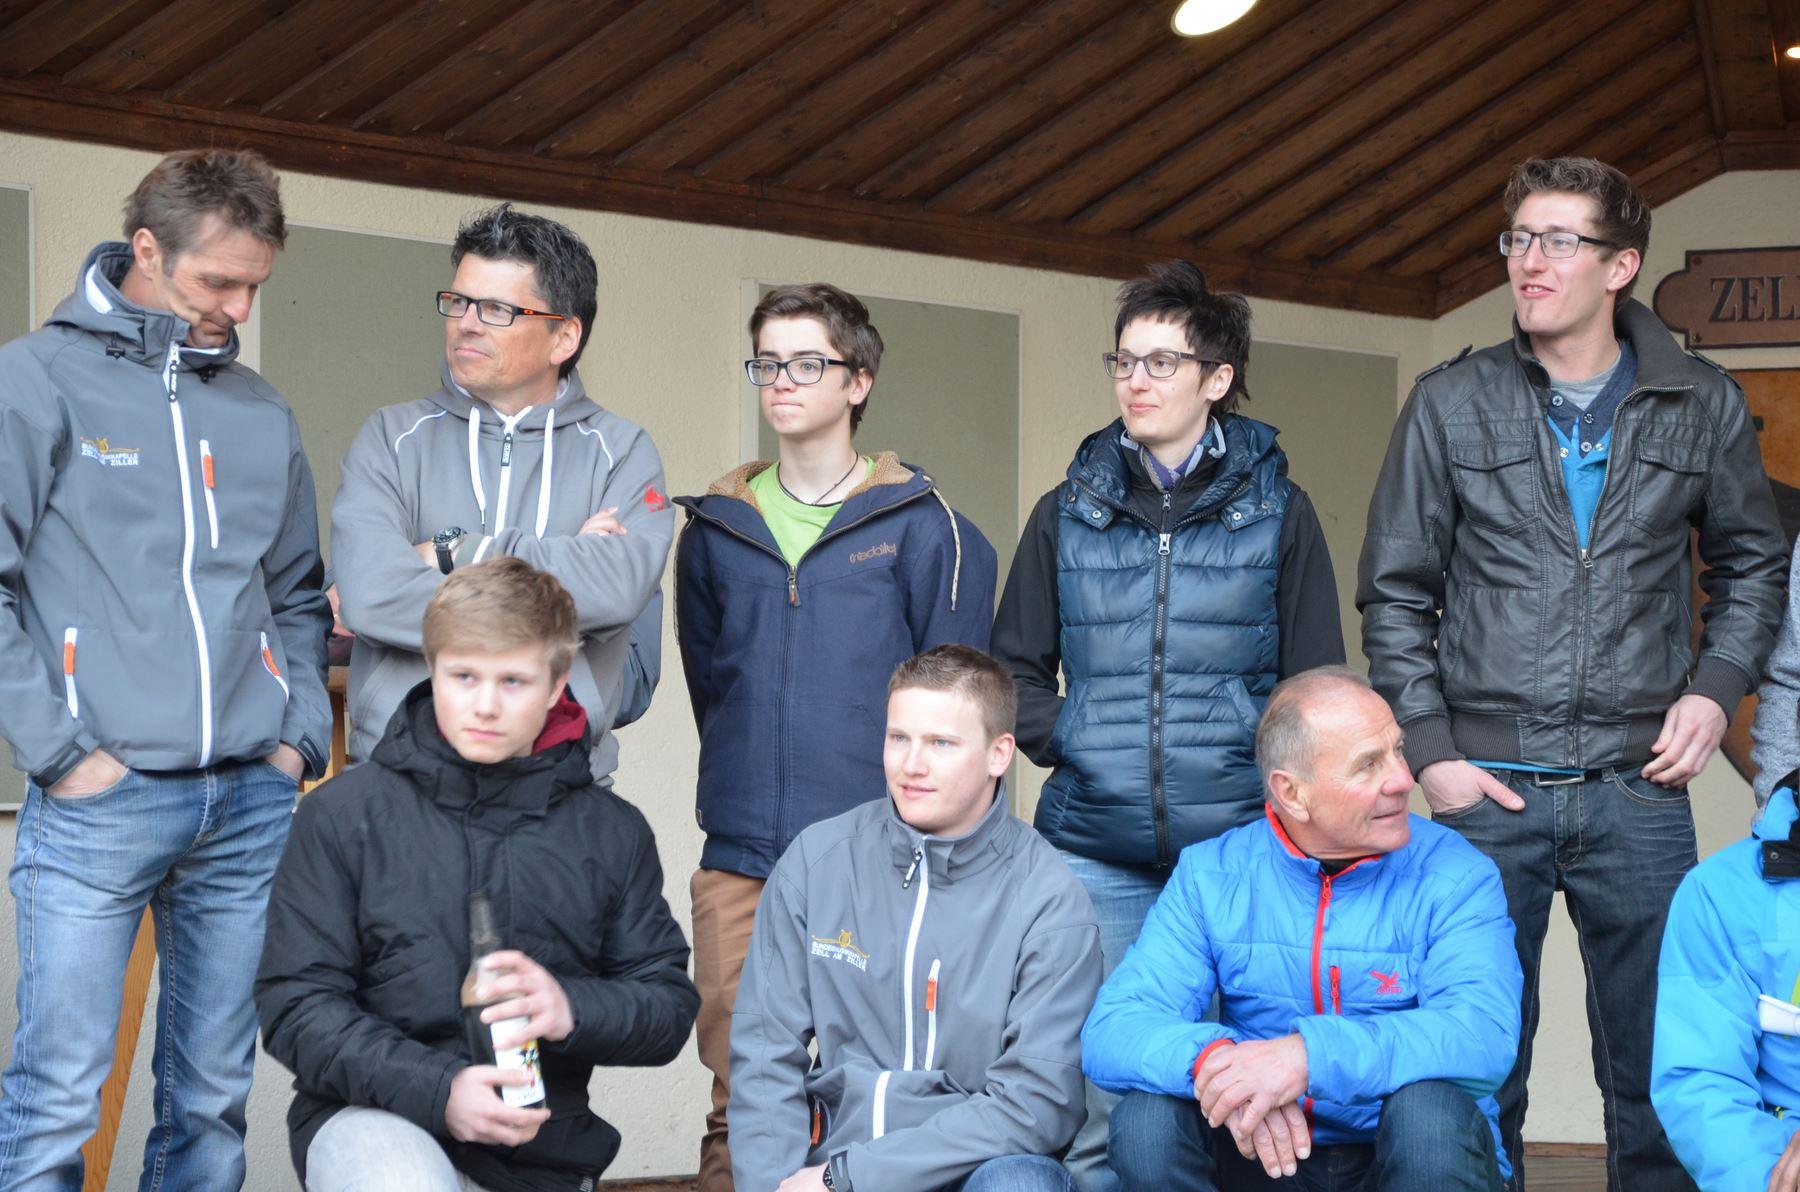 2015-03-22 BV Zillertal Skirennen 557.JPG